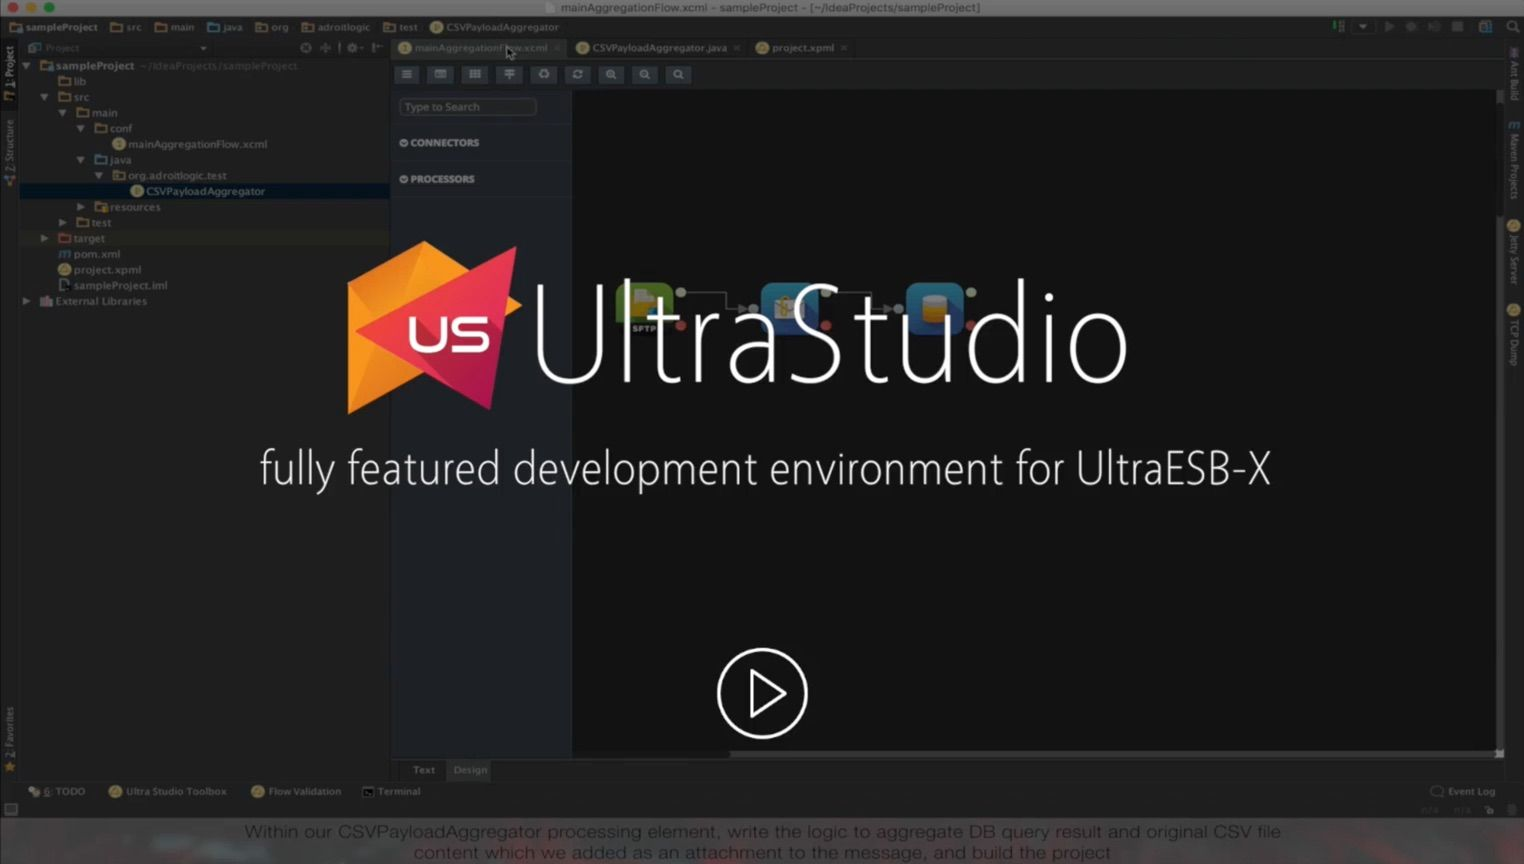 UltraStudio - Integration solution development made better | AdroitLogic